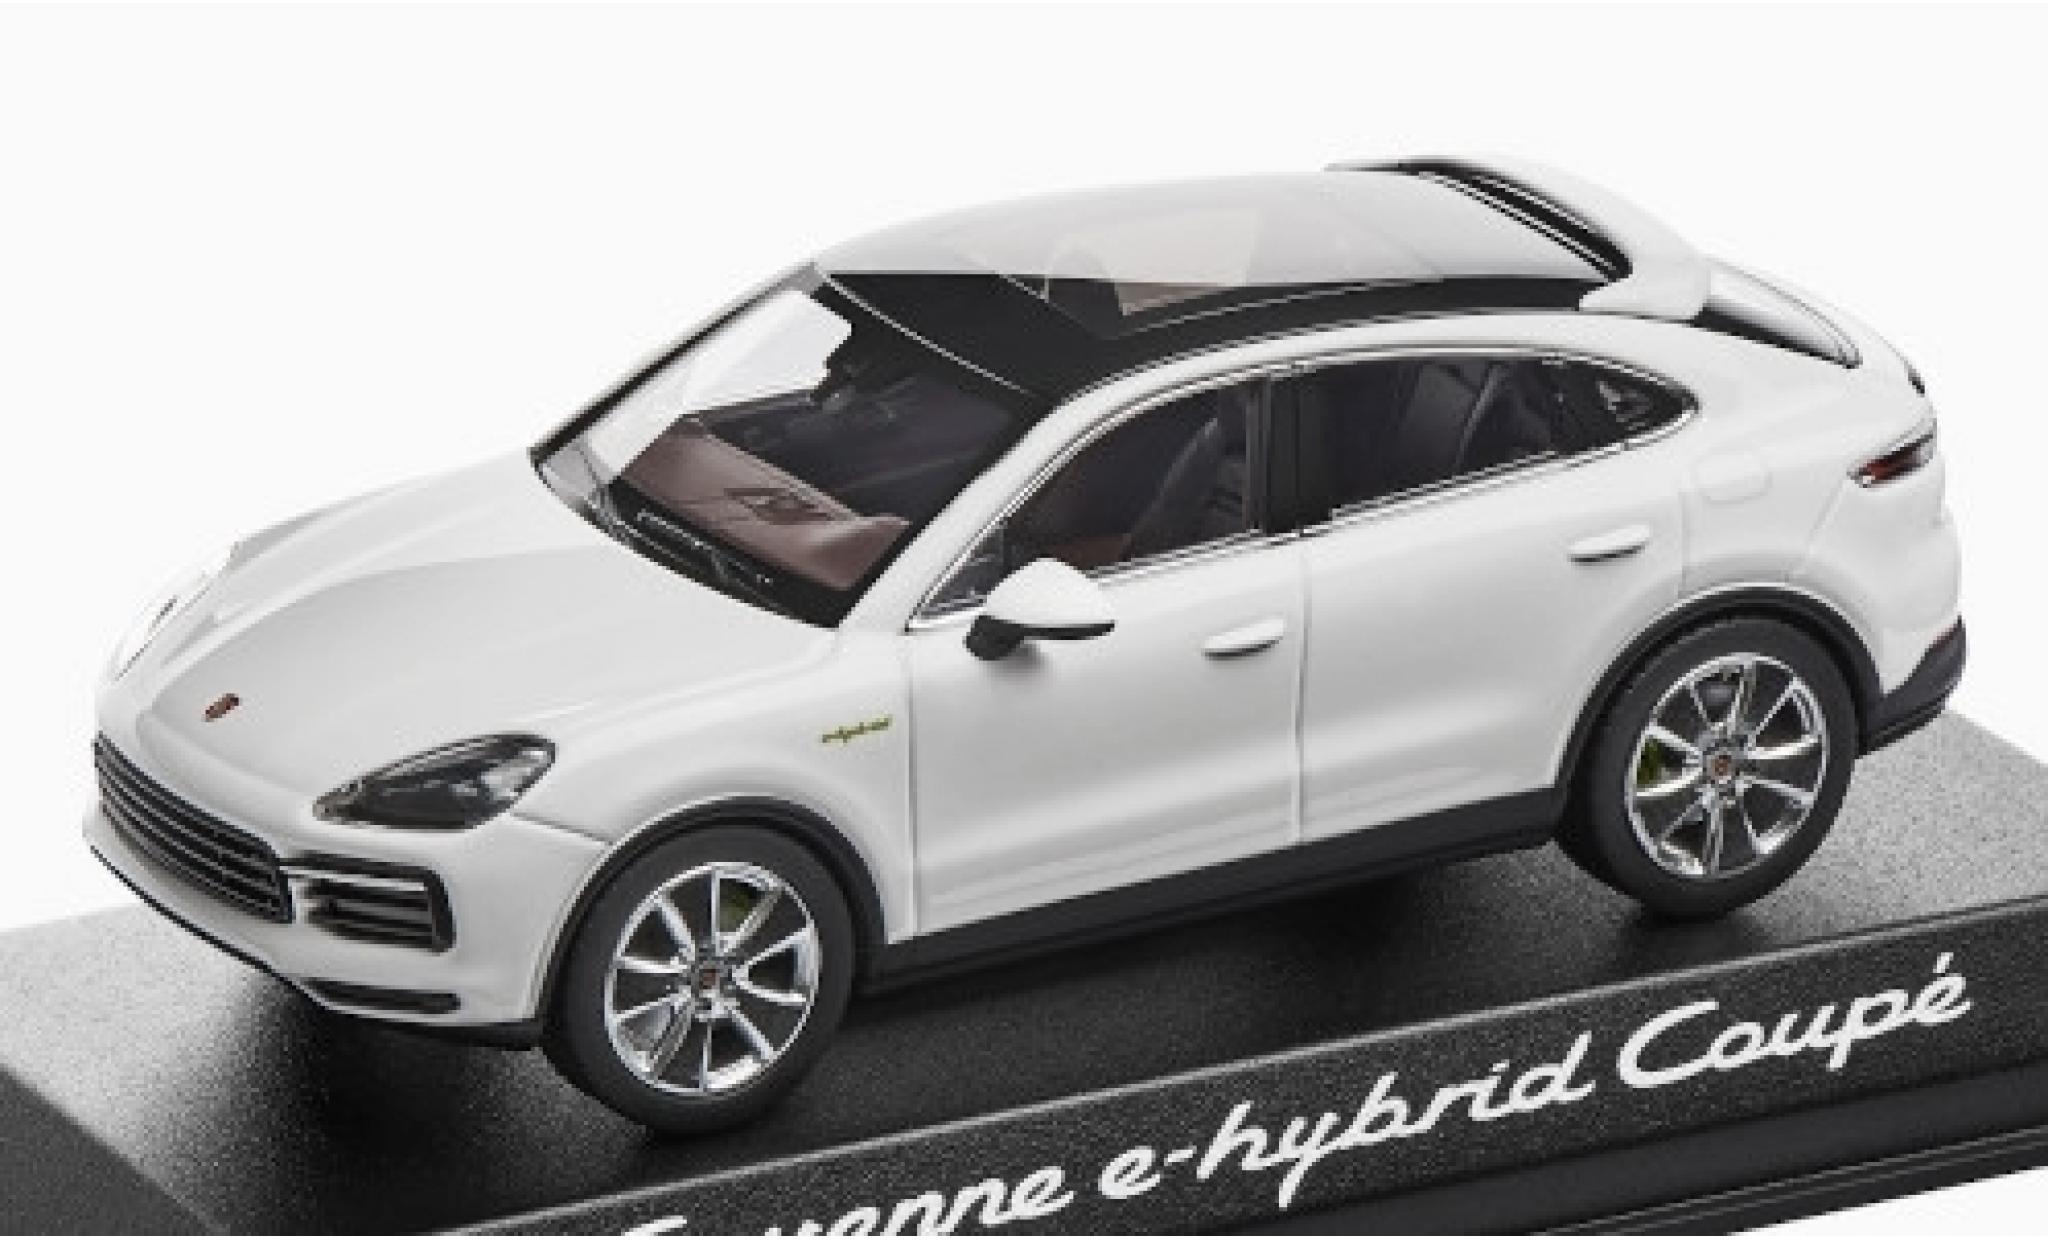 Diecast Model Cars Porsche Cayenne E Hybrid 1 43 Norev Coupe White 2019 Alldiecast Co Uk